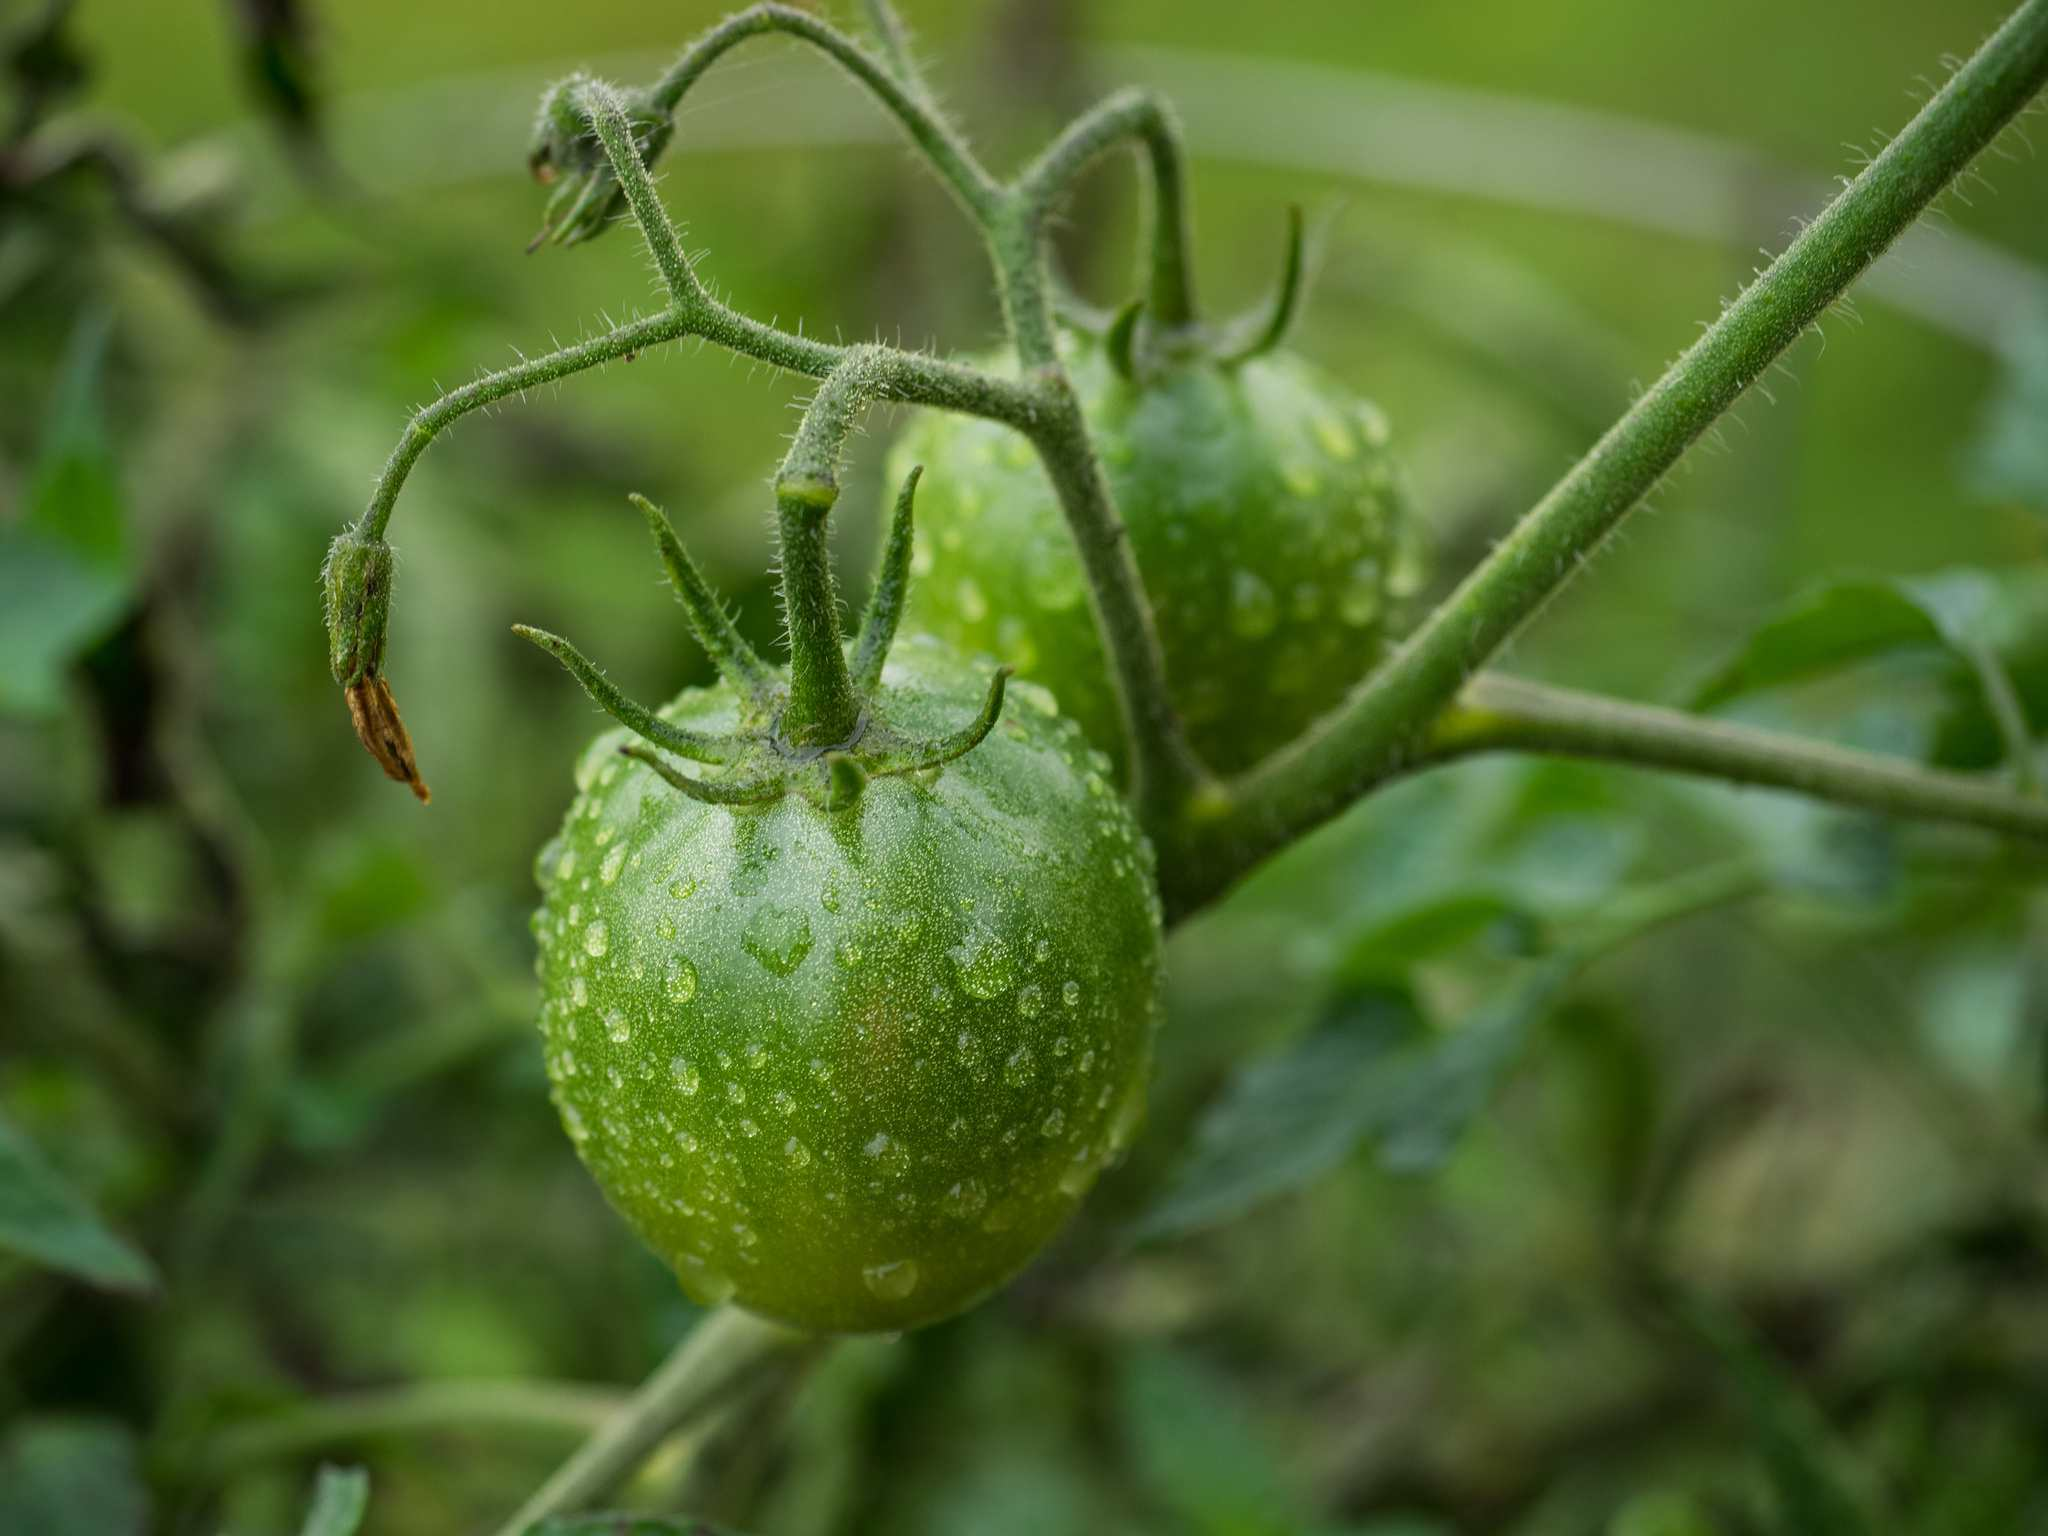 A black prince tomato